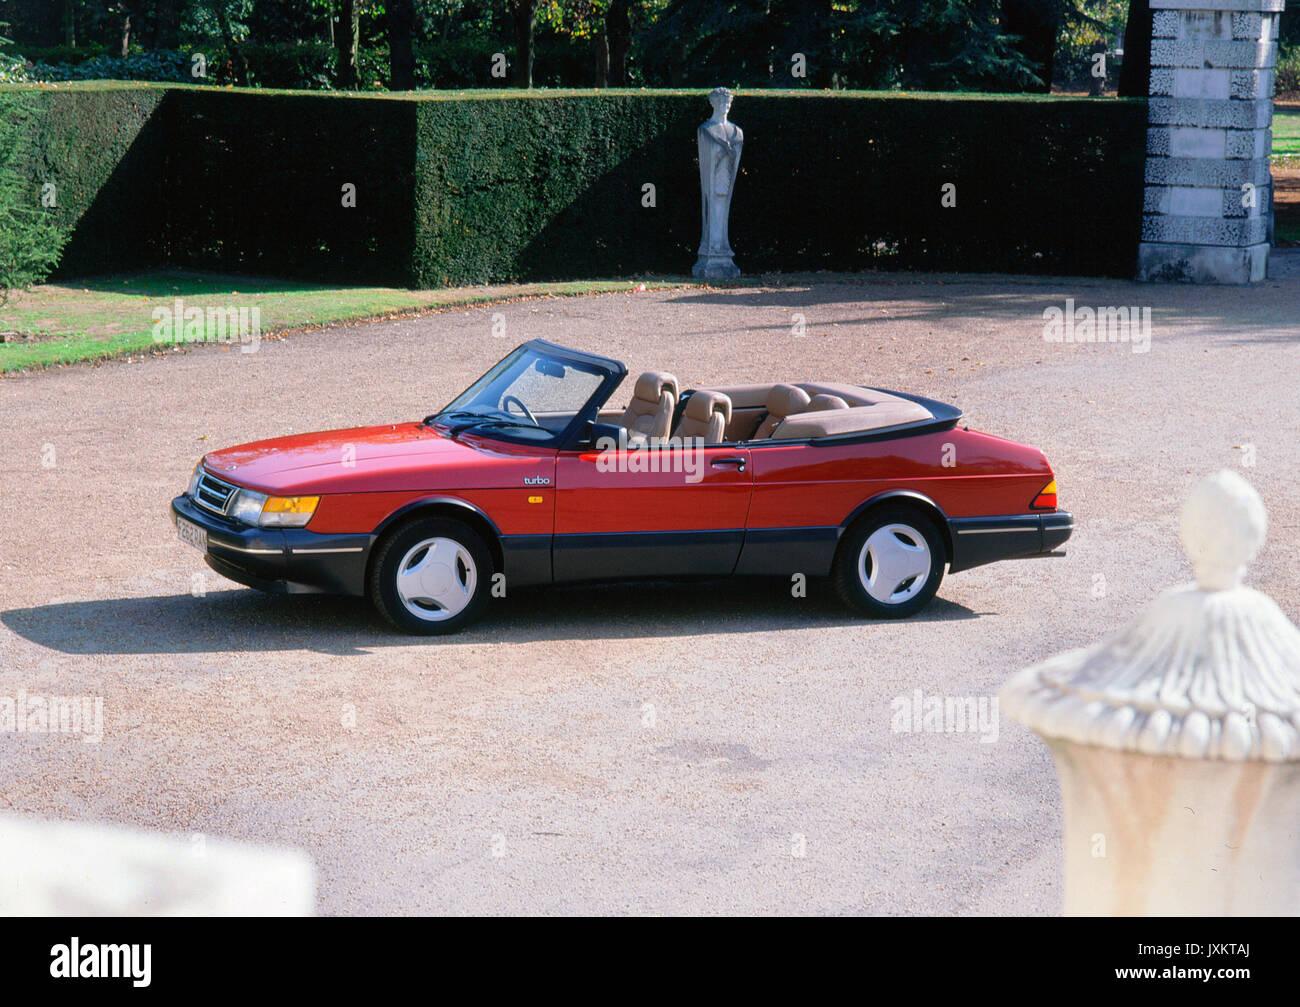 1989 Saab 900 turbo convertible - Stock Image